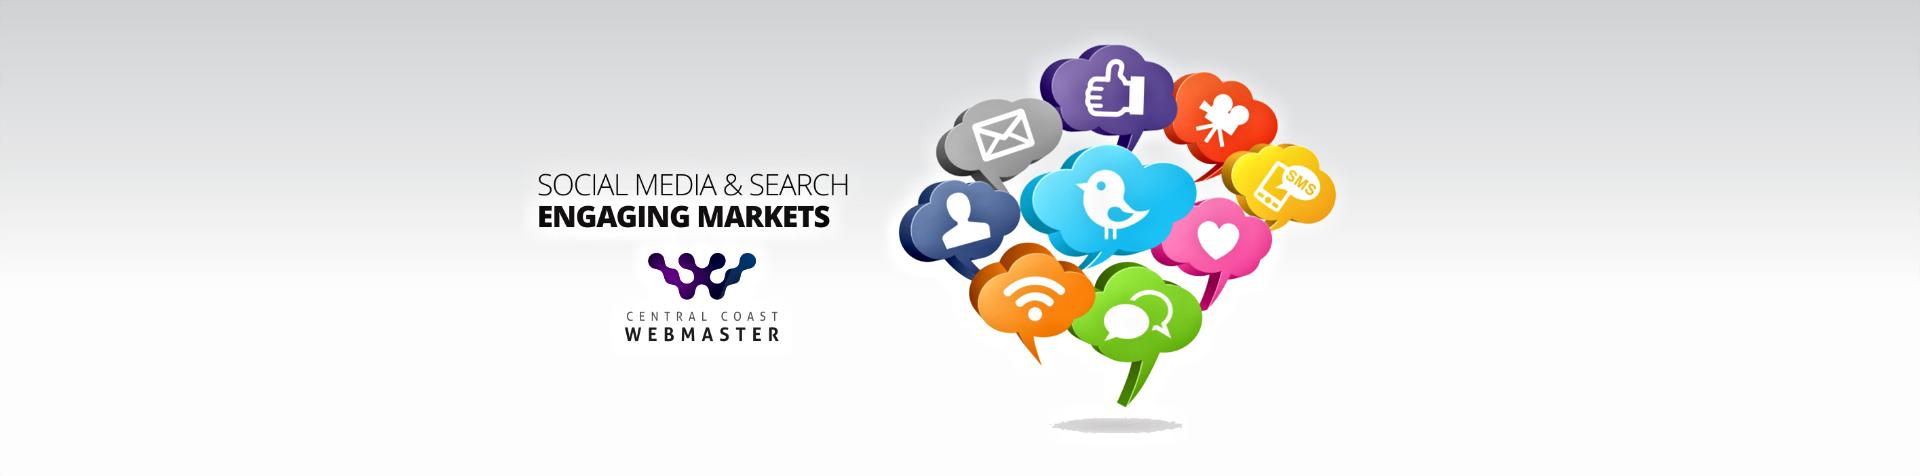 Central Coast Webmaster Social Media & Search